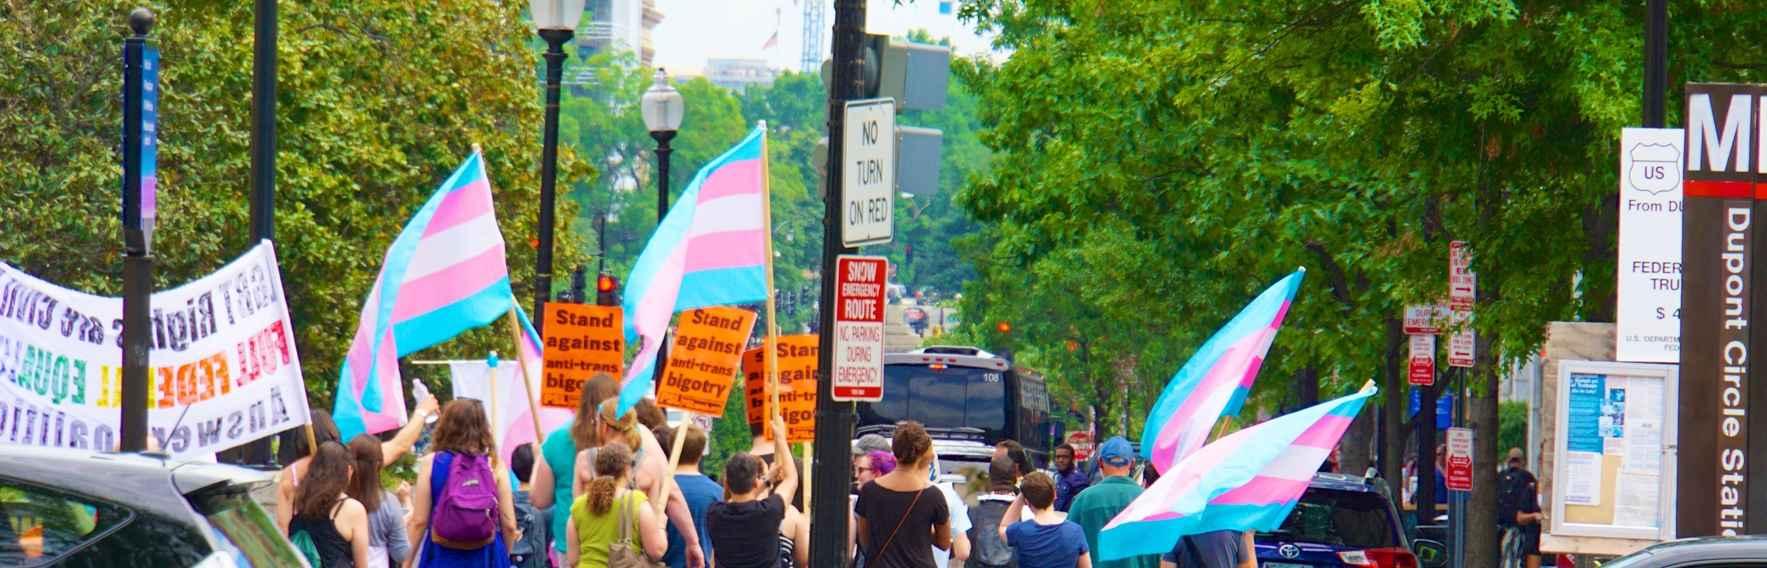 Transgender Advocacy Awards 2019 Sponsors image